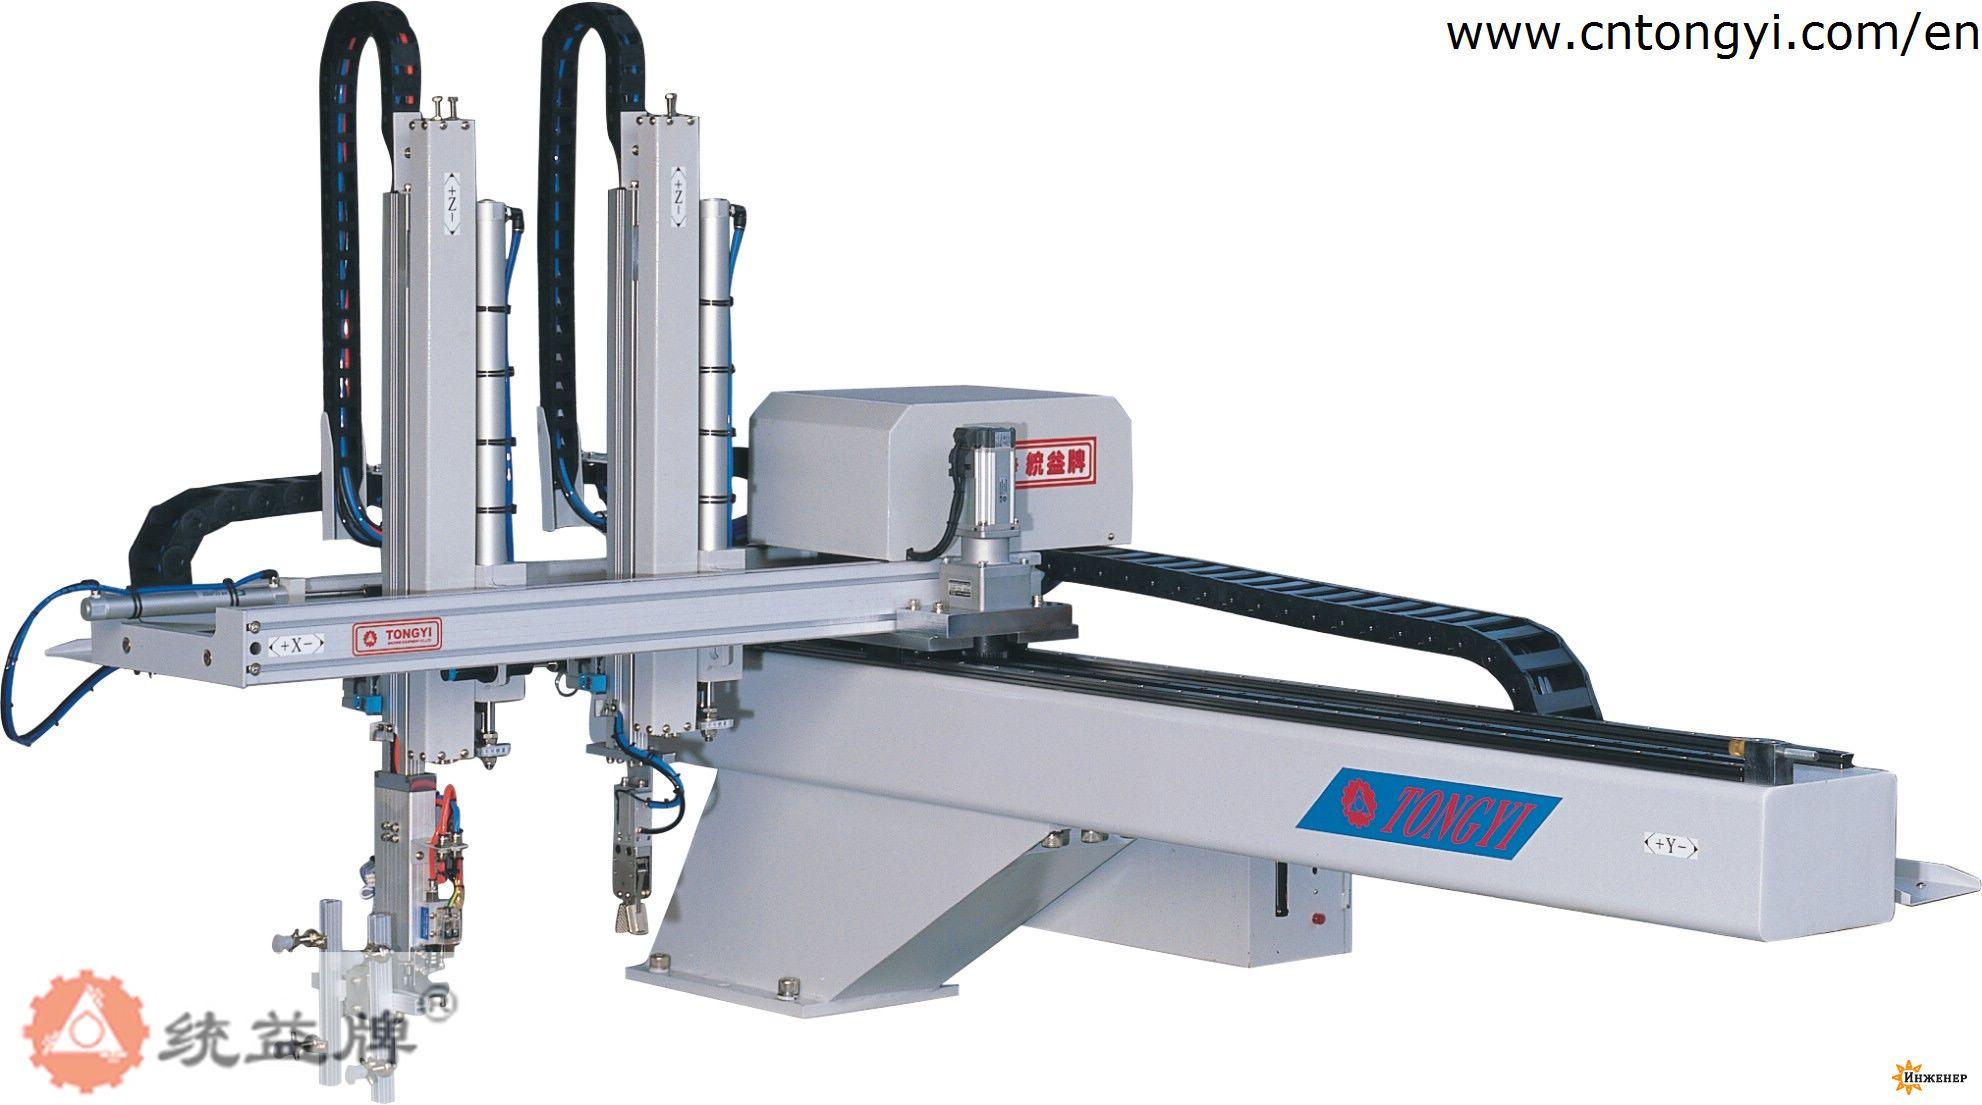 2681_industrialrobottyb900wdws.jpg (173.33 Kb)